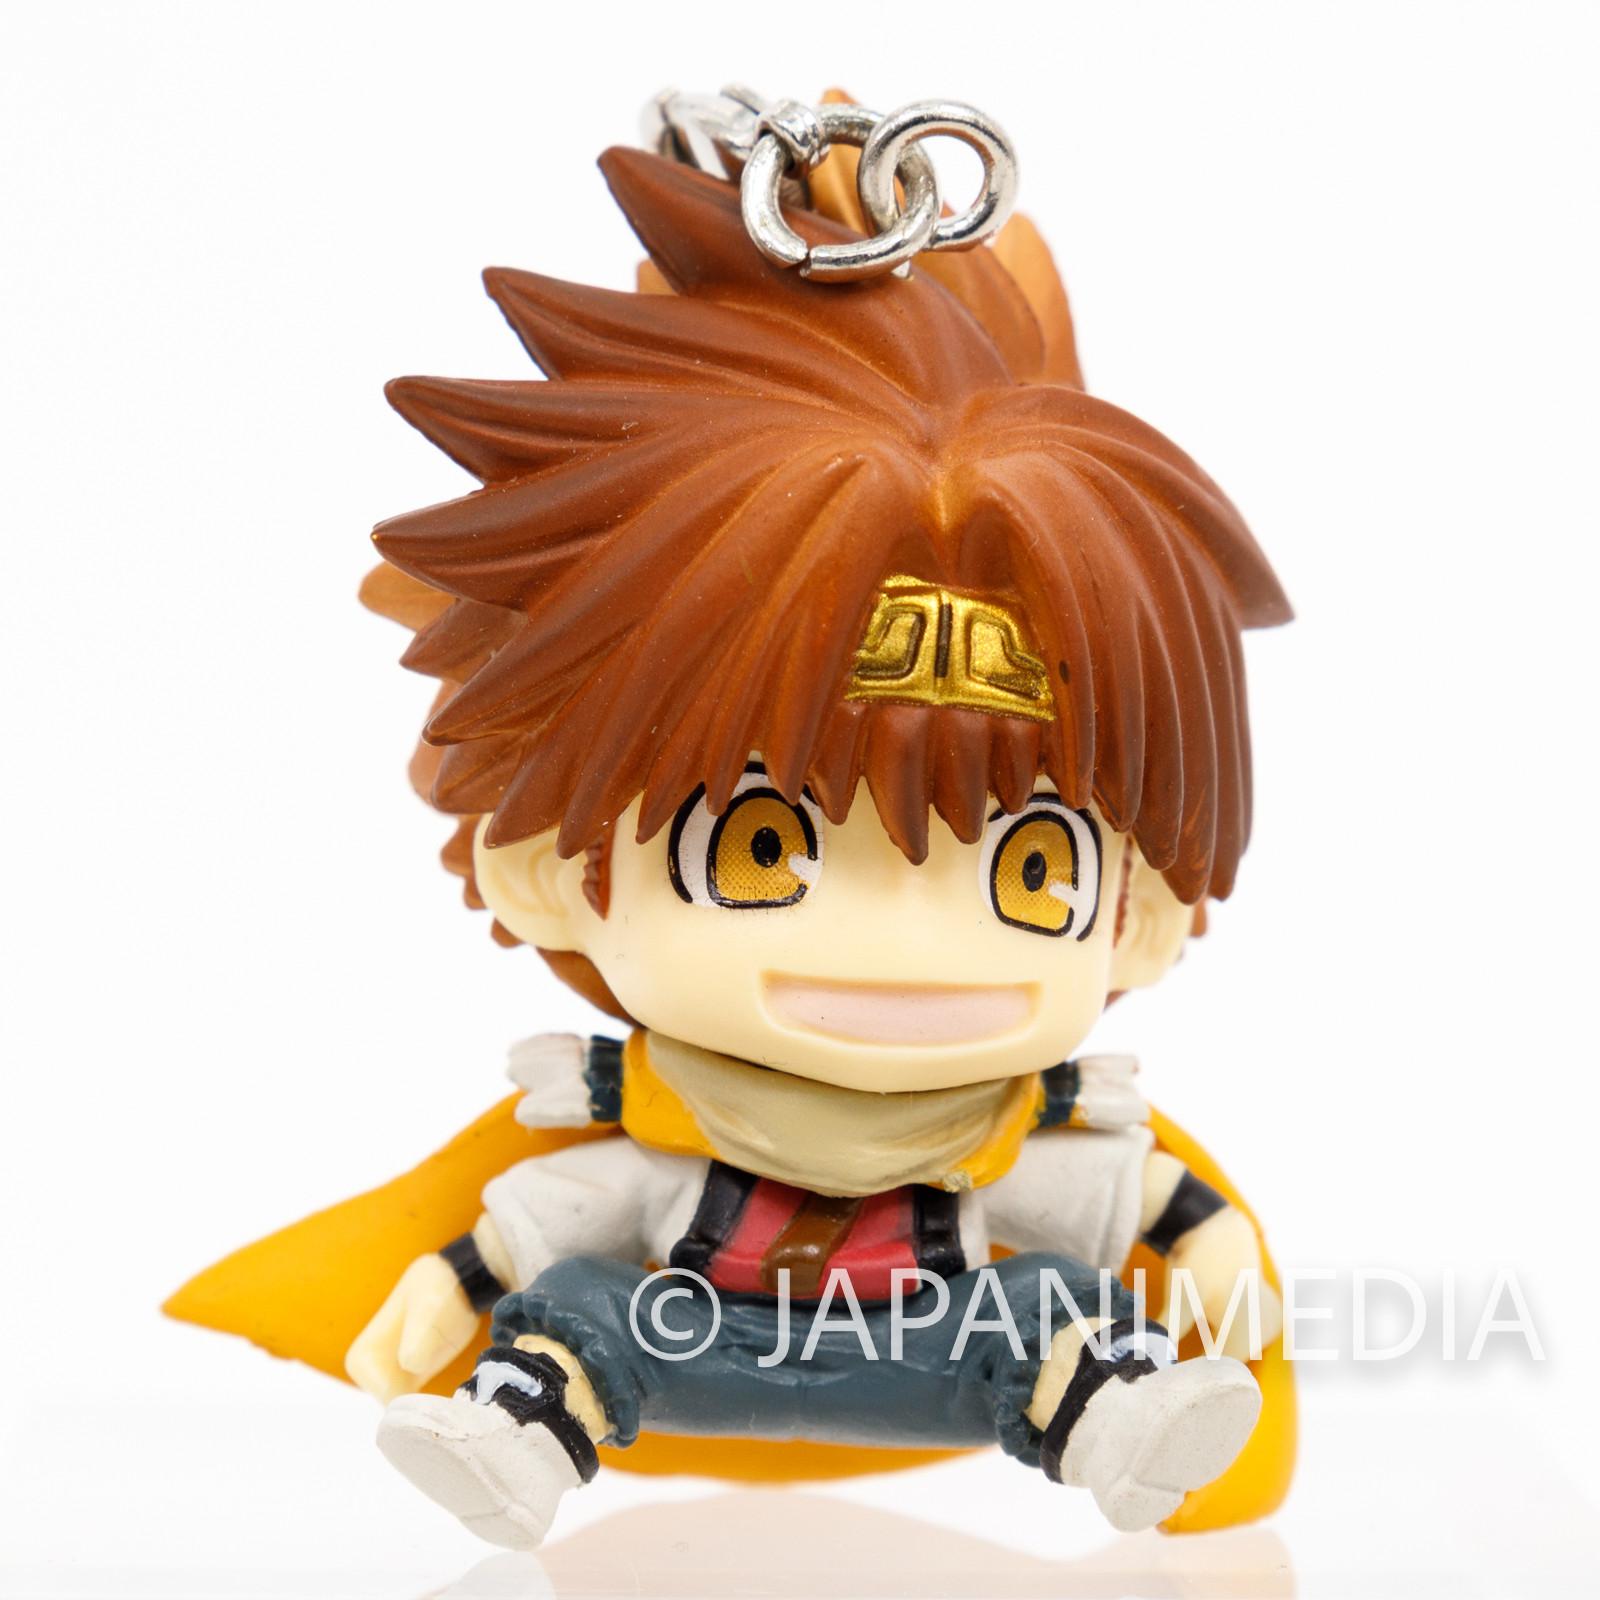 SAIYUKI Son Goku KaraCole Mascot Figure Movic Kazuya Minekura JAPAN